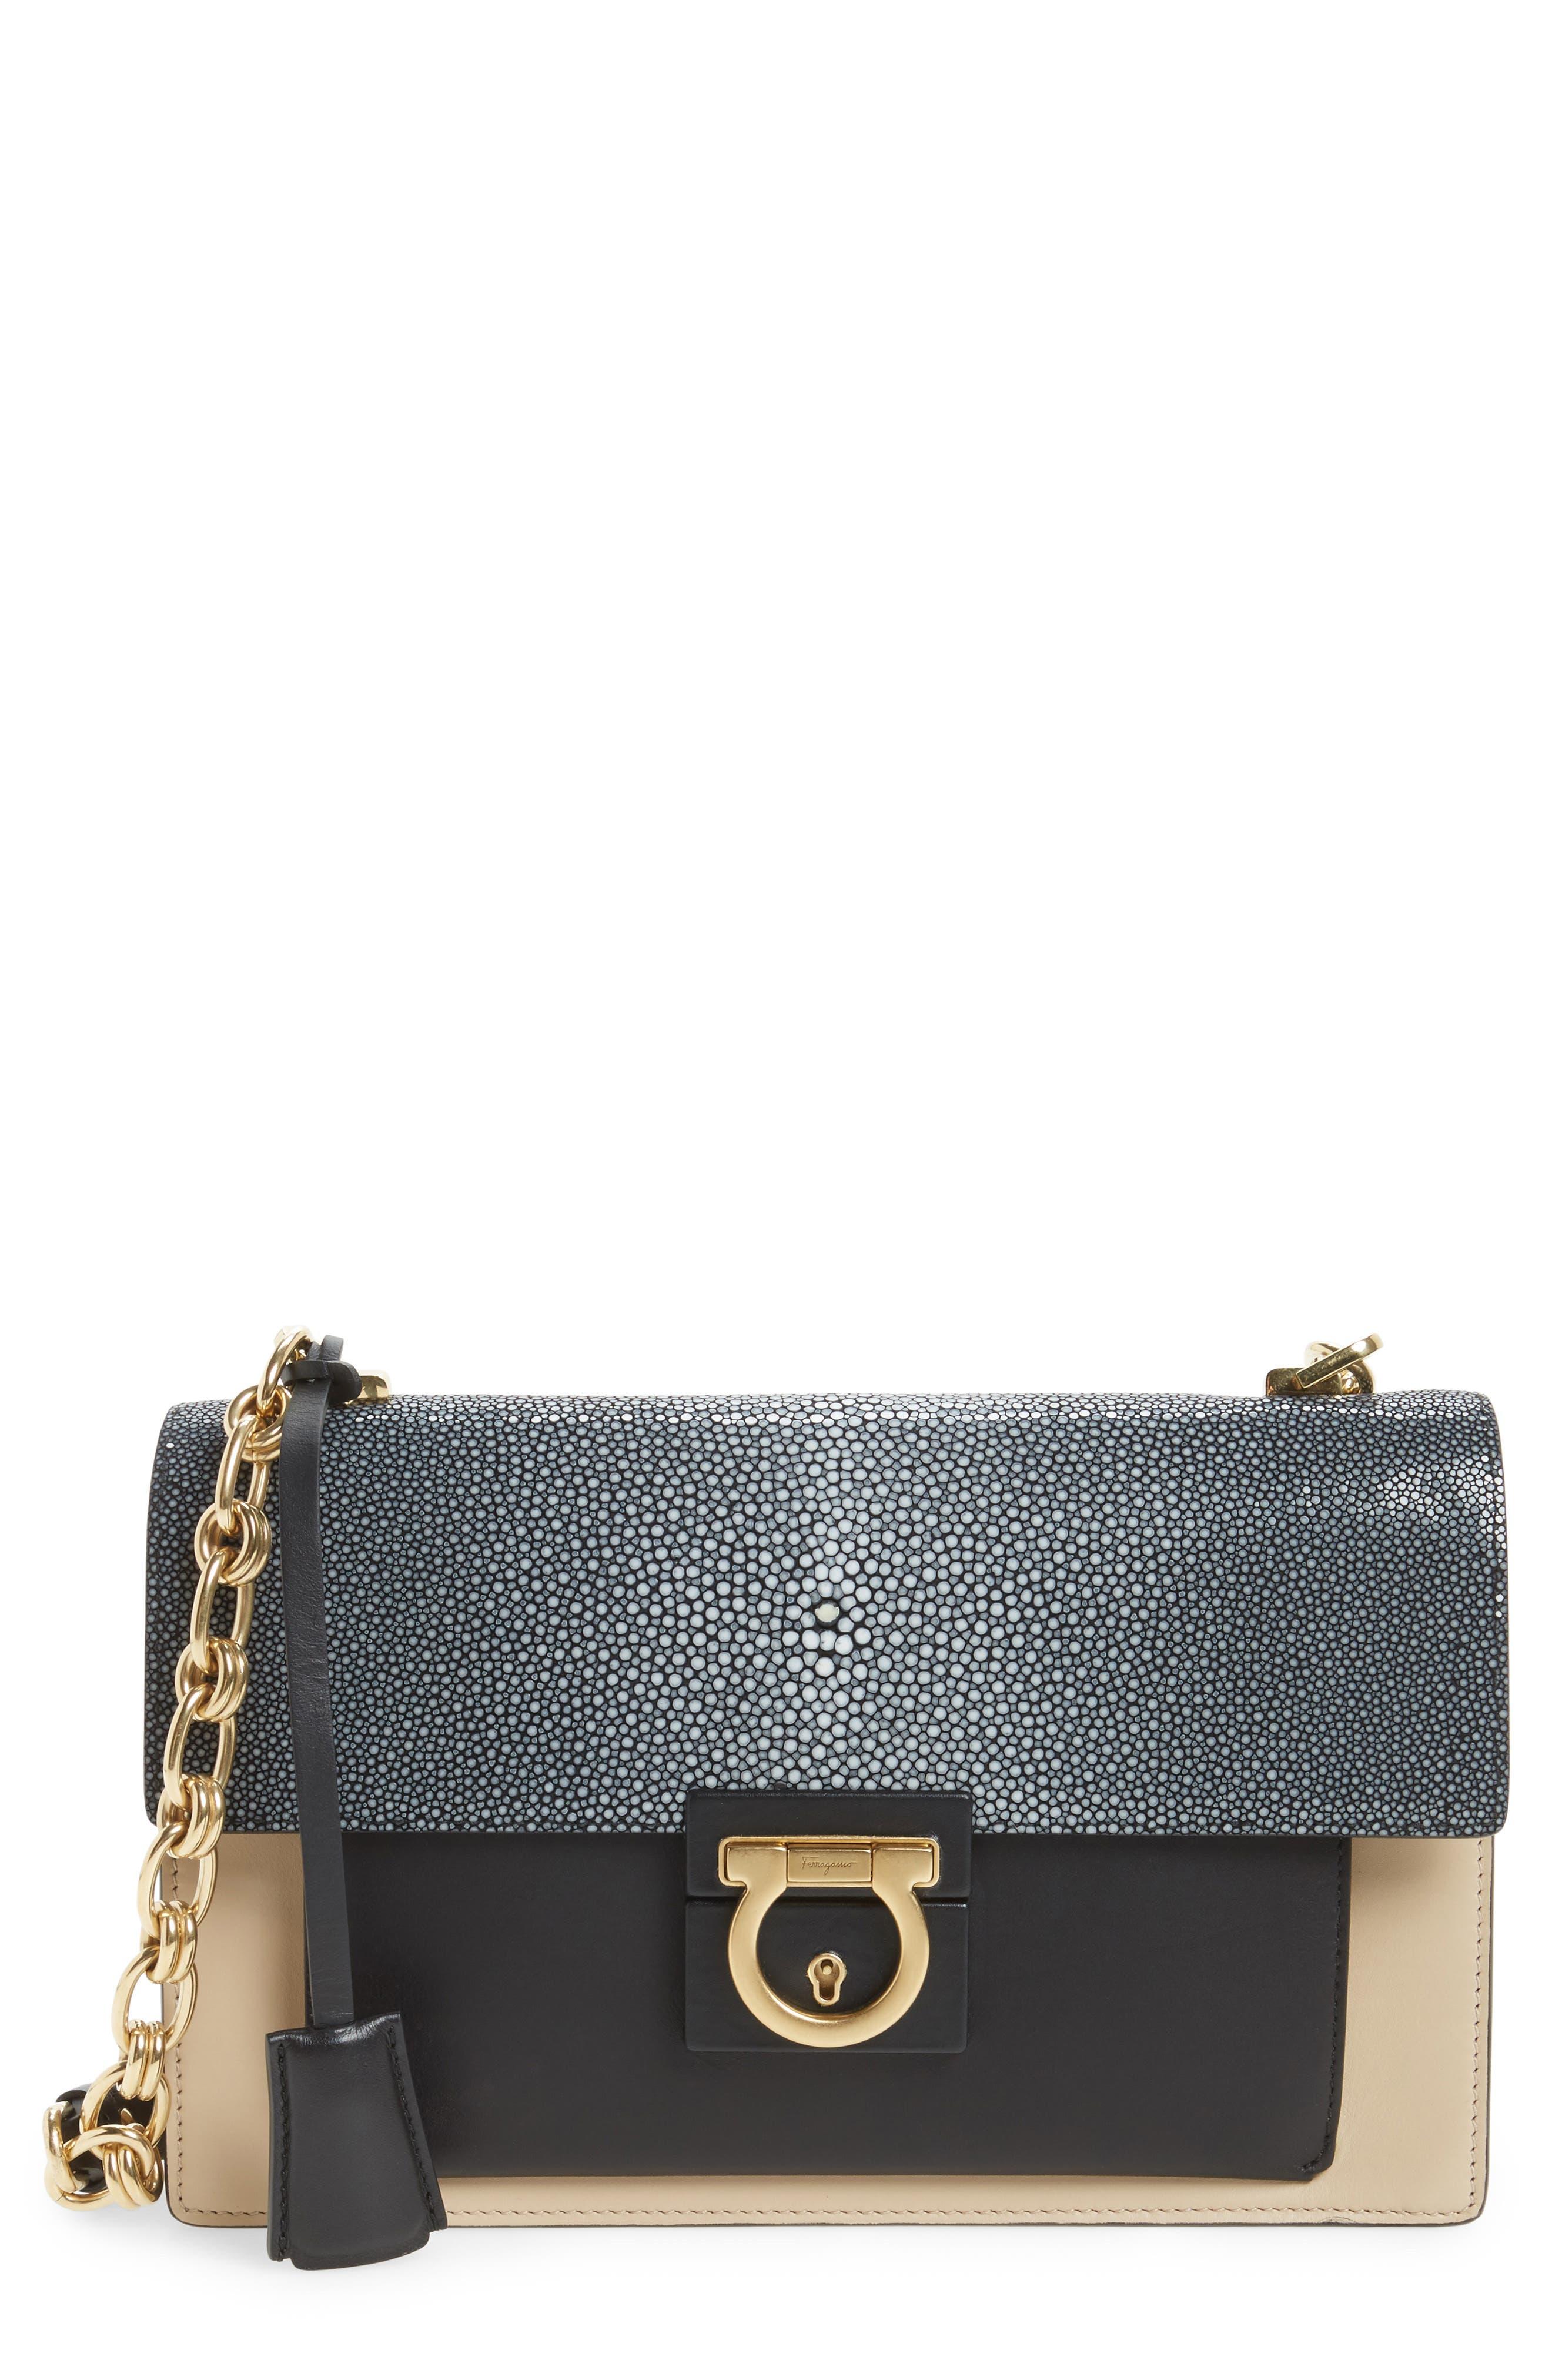 Alternate Image 1 Selected - Salvatore Ferragamo Stingray Leather Shoulder Bag